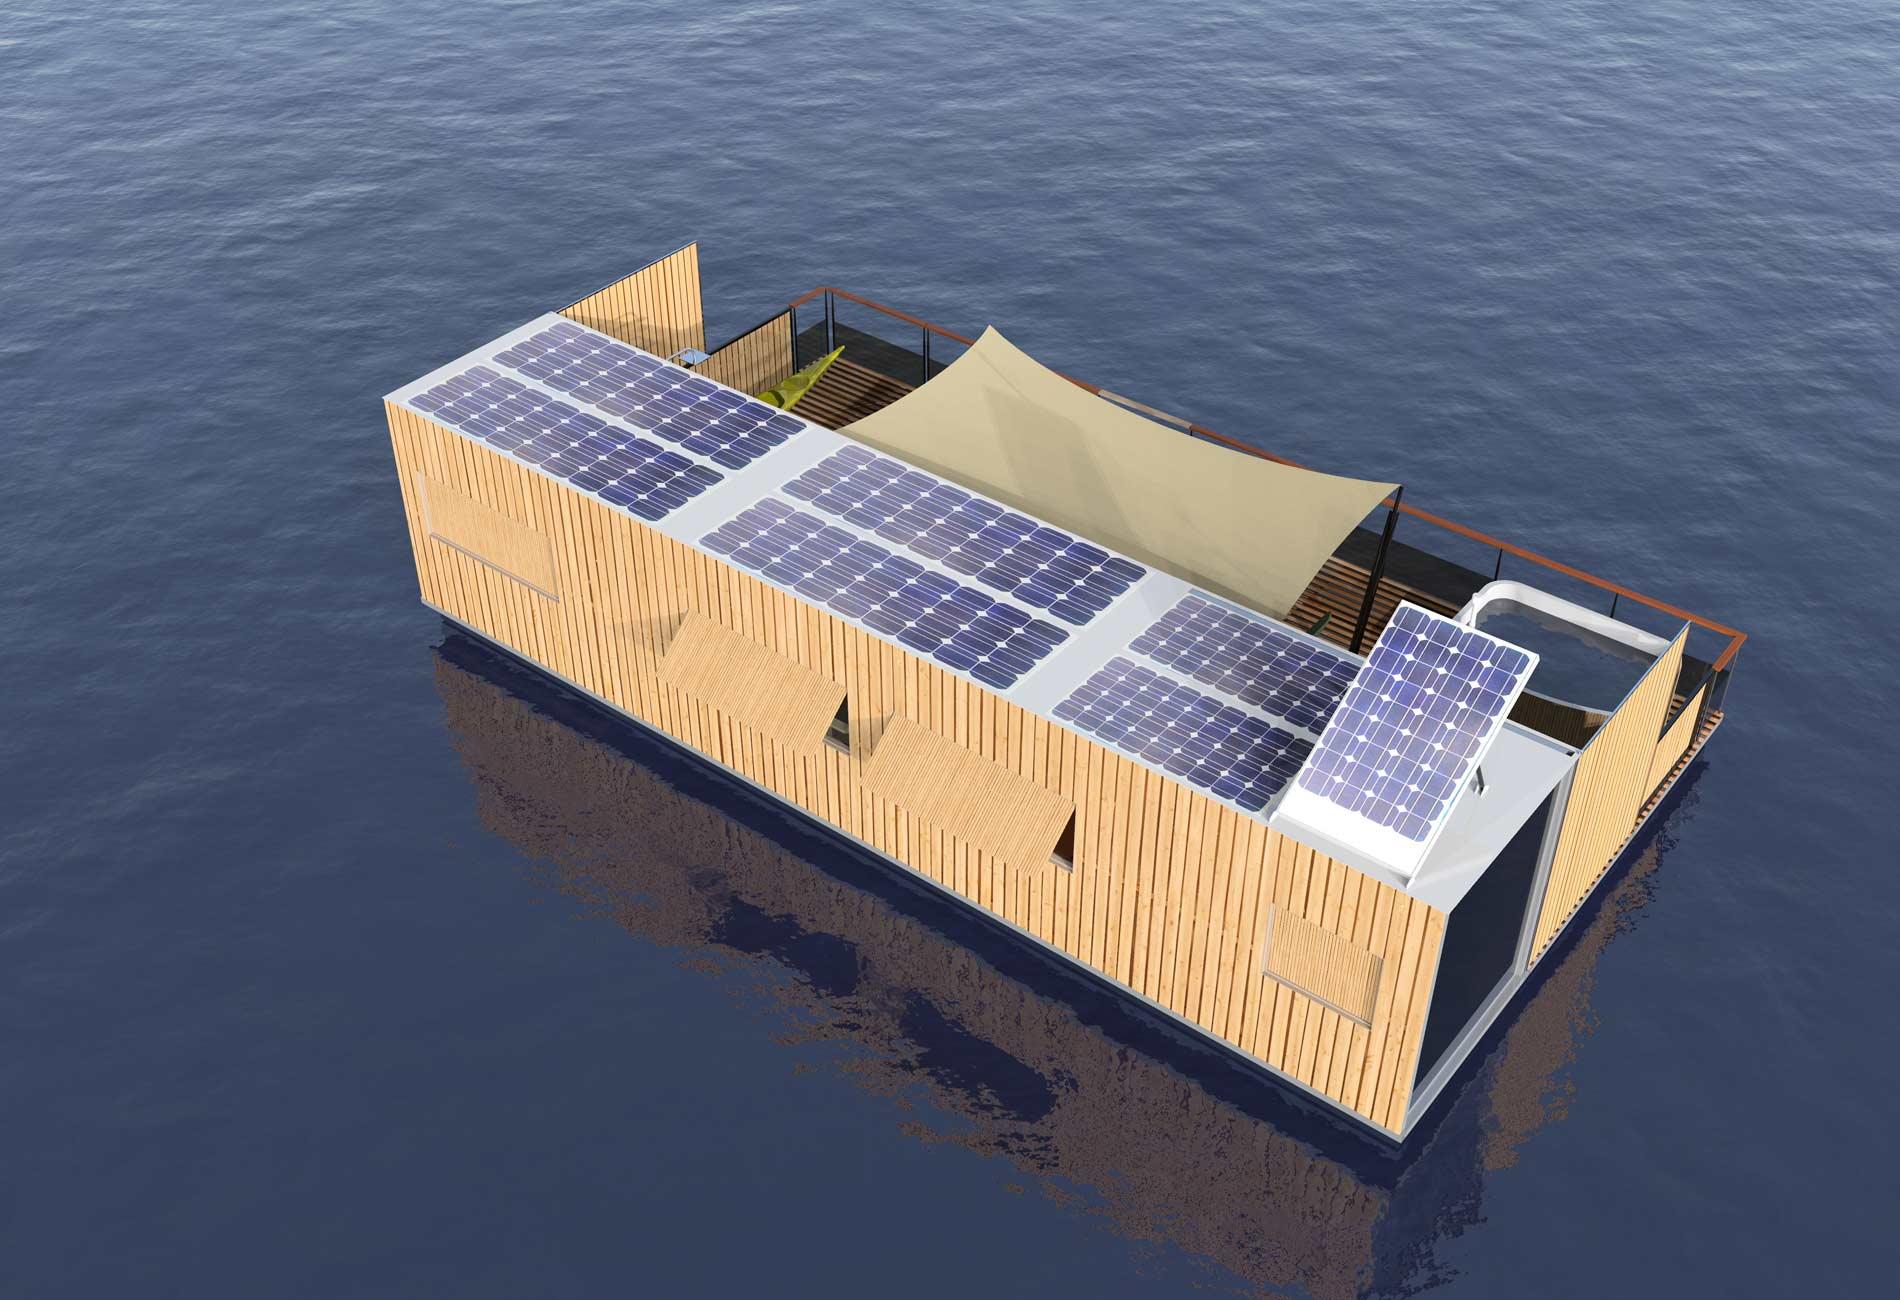 HouseBoat-Architecte-Vincent-Lebailly-Format-container-Habitation-flottante-Innovation